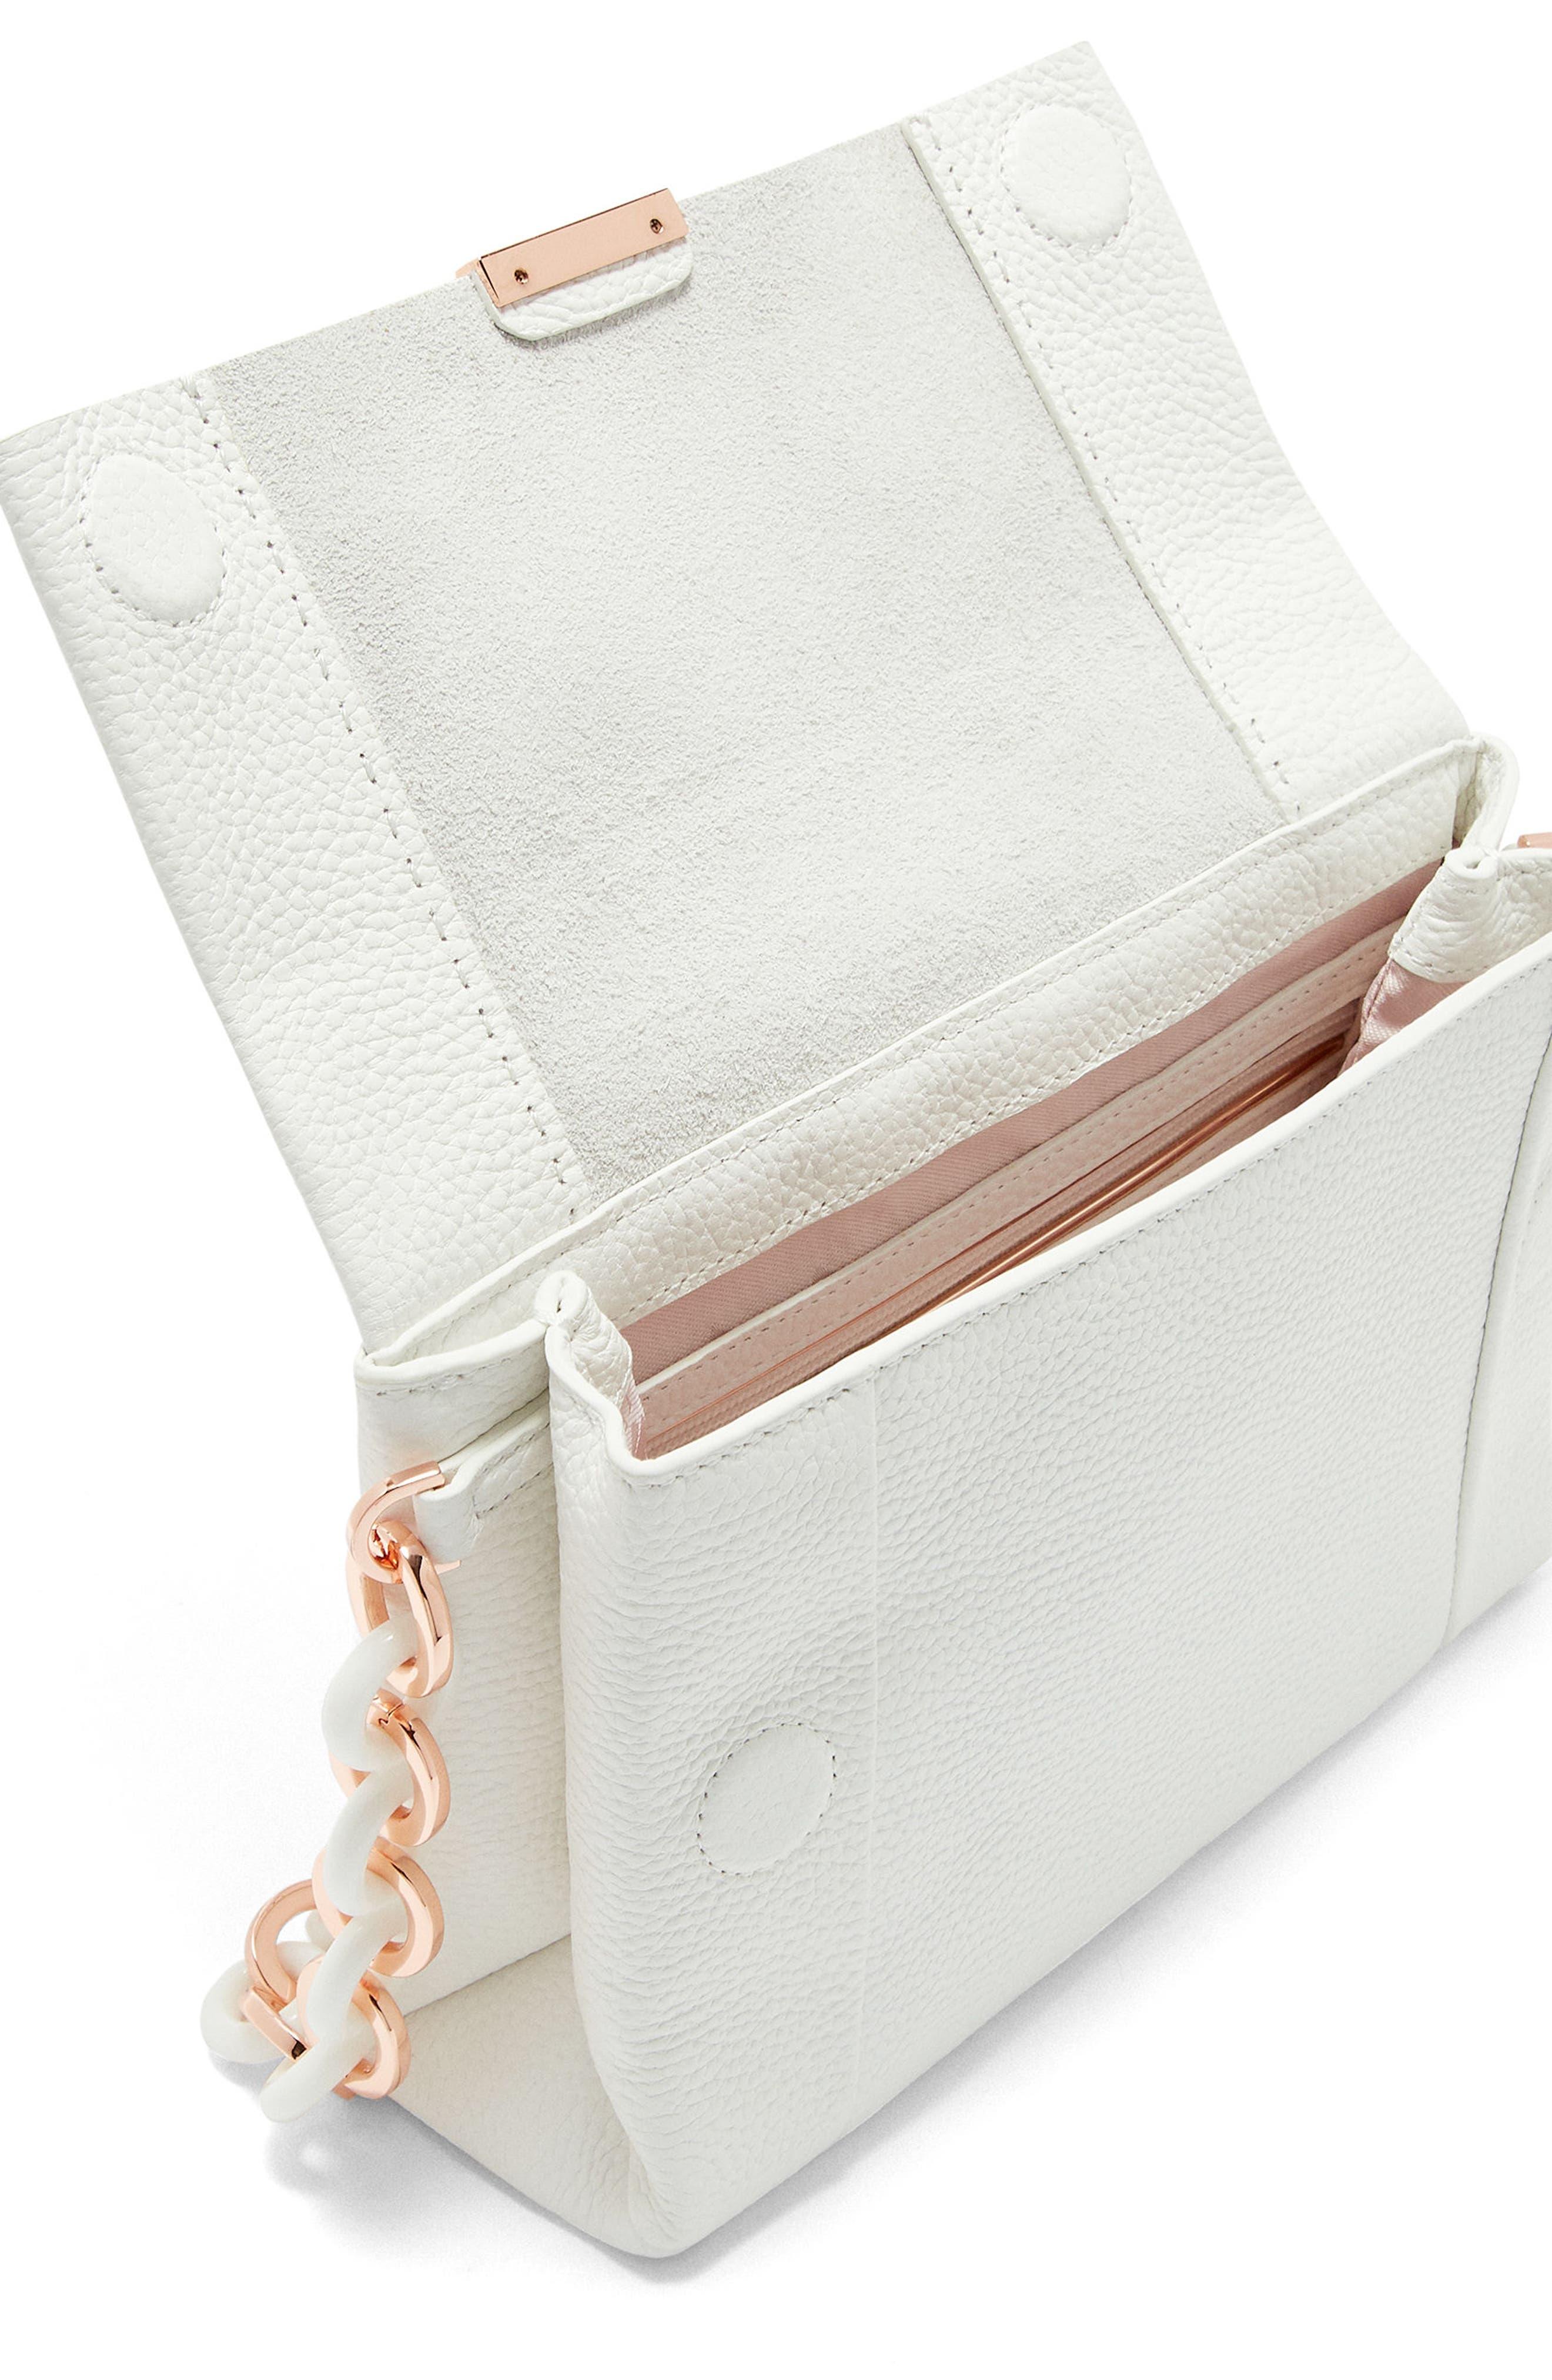 Ipomoea Leather Shoulder Bag,                             Alternate thumbnail 8, color,